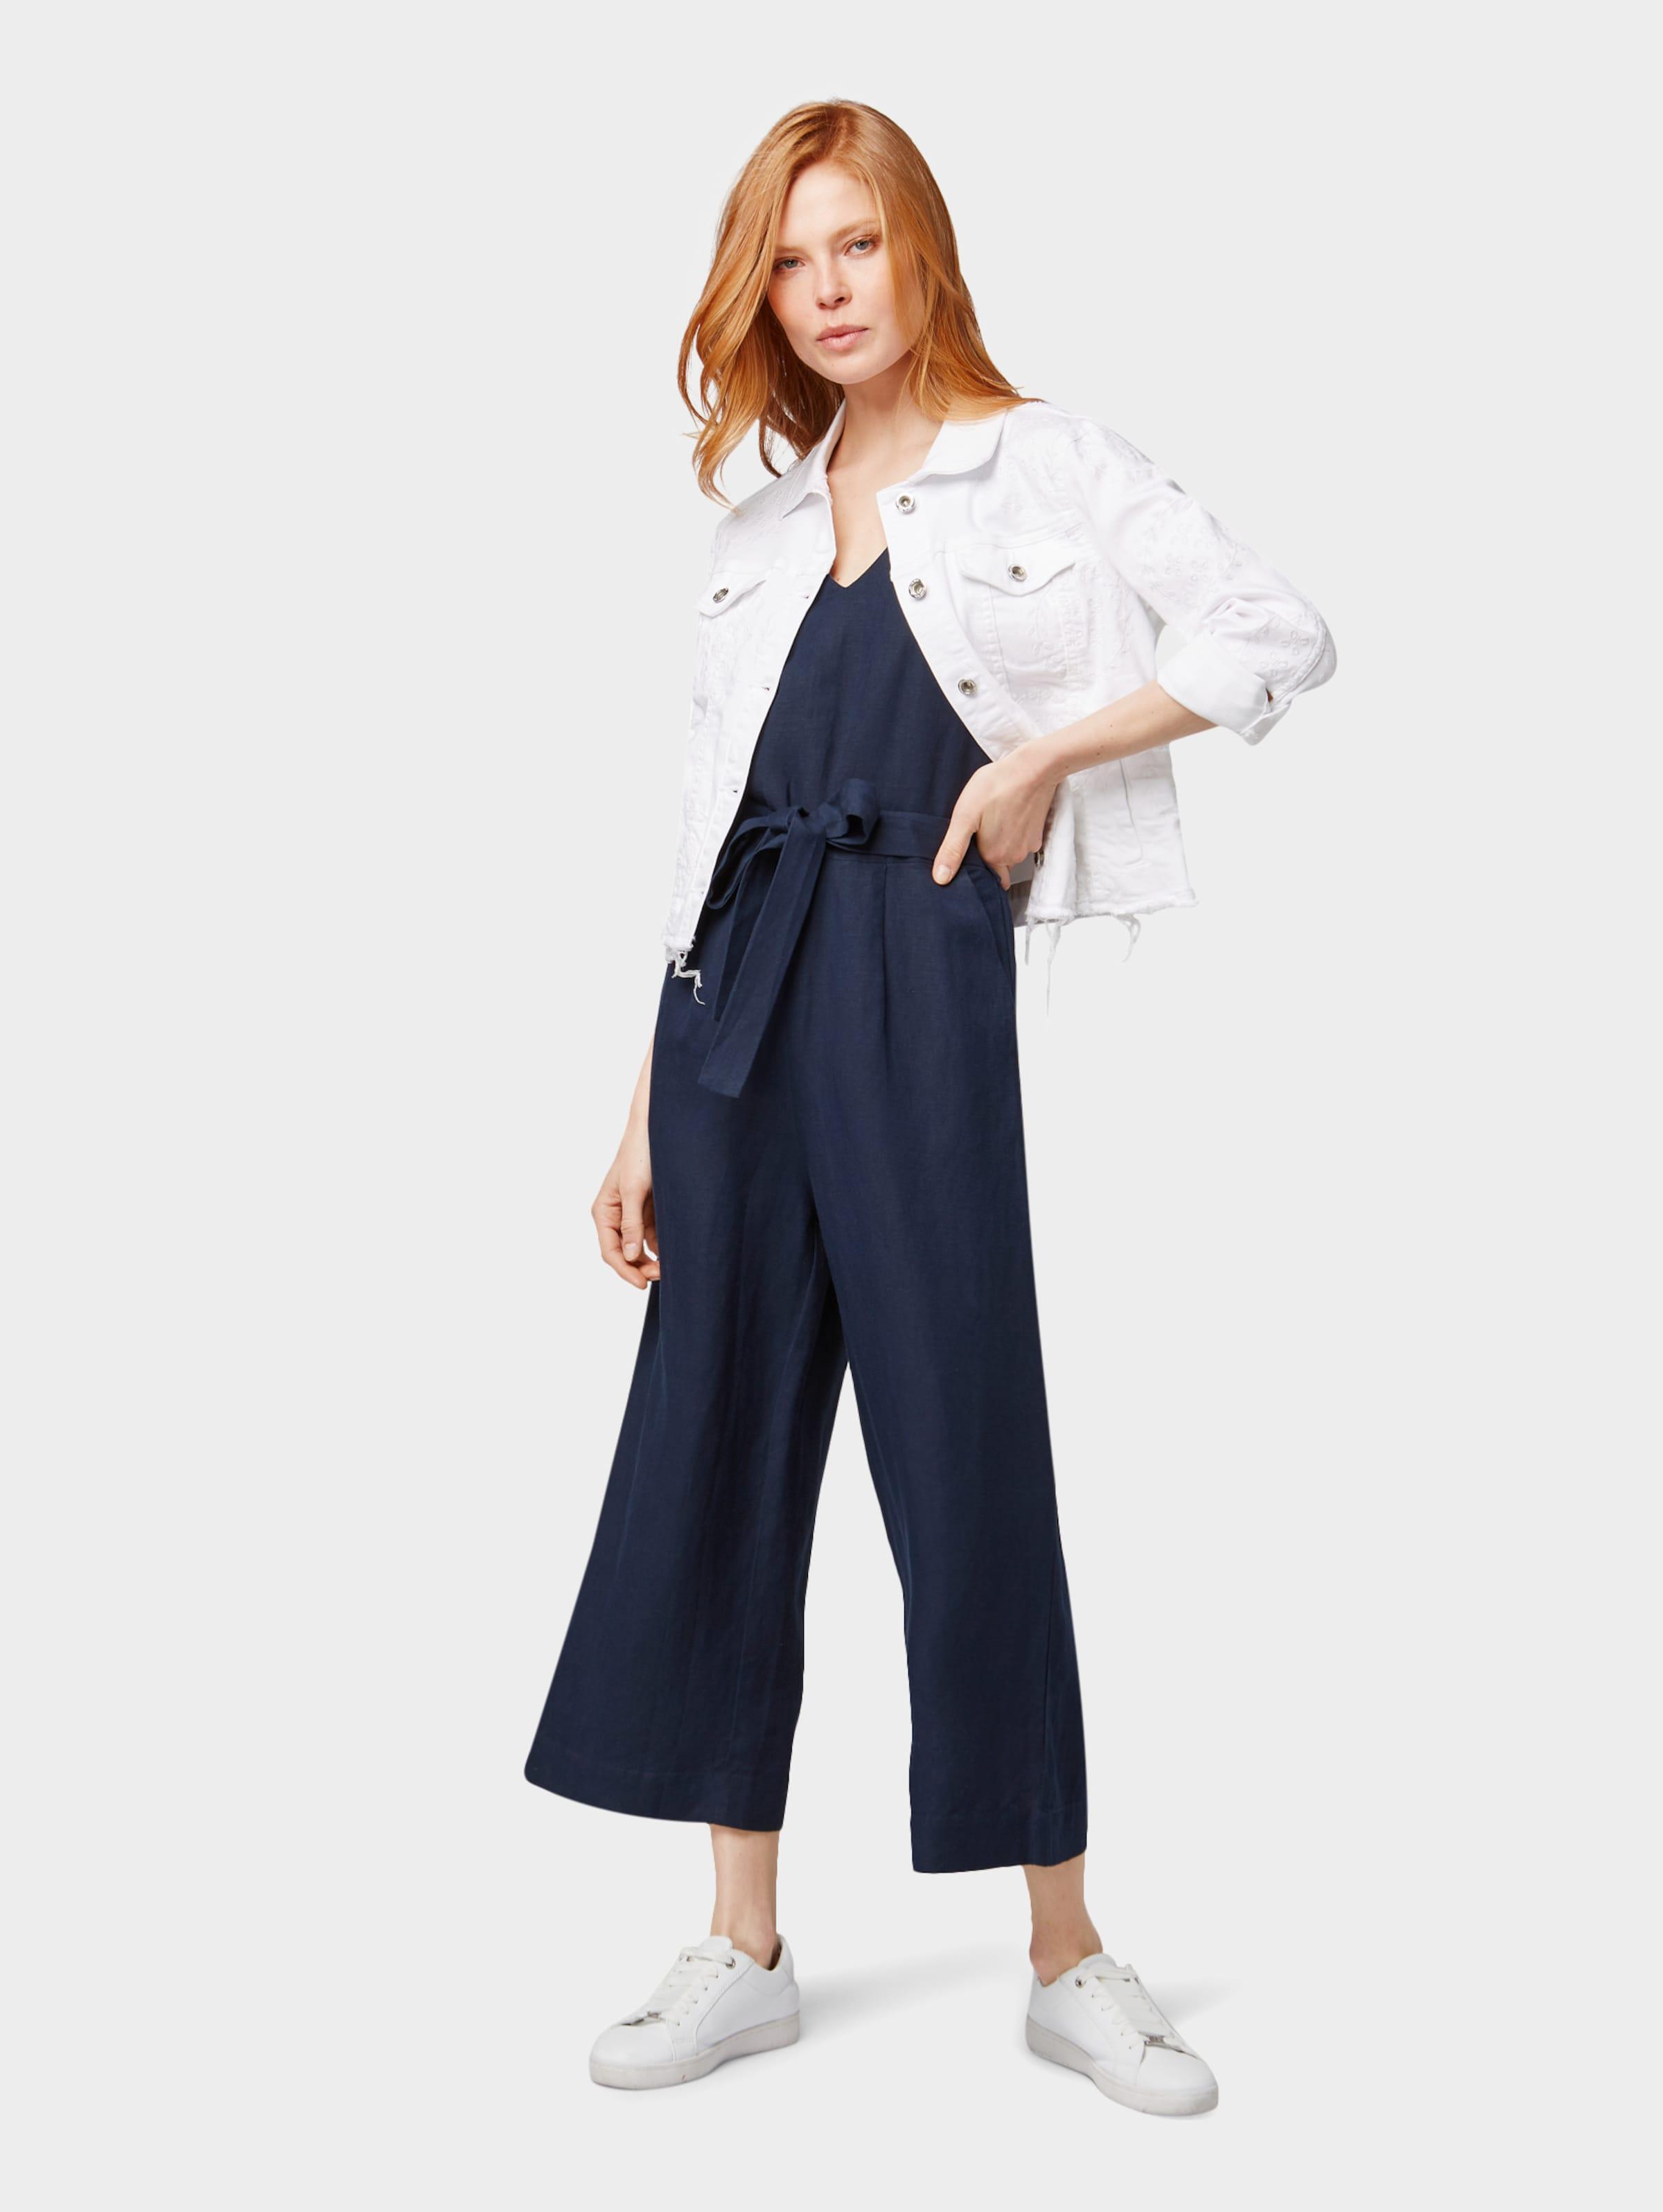 Garrn' Tailor Jeansjacke 'toni In Tom Weiß N0vm8nw